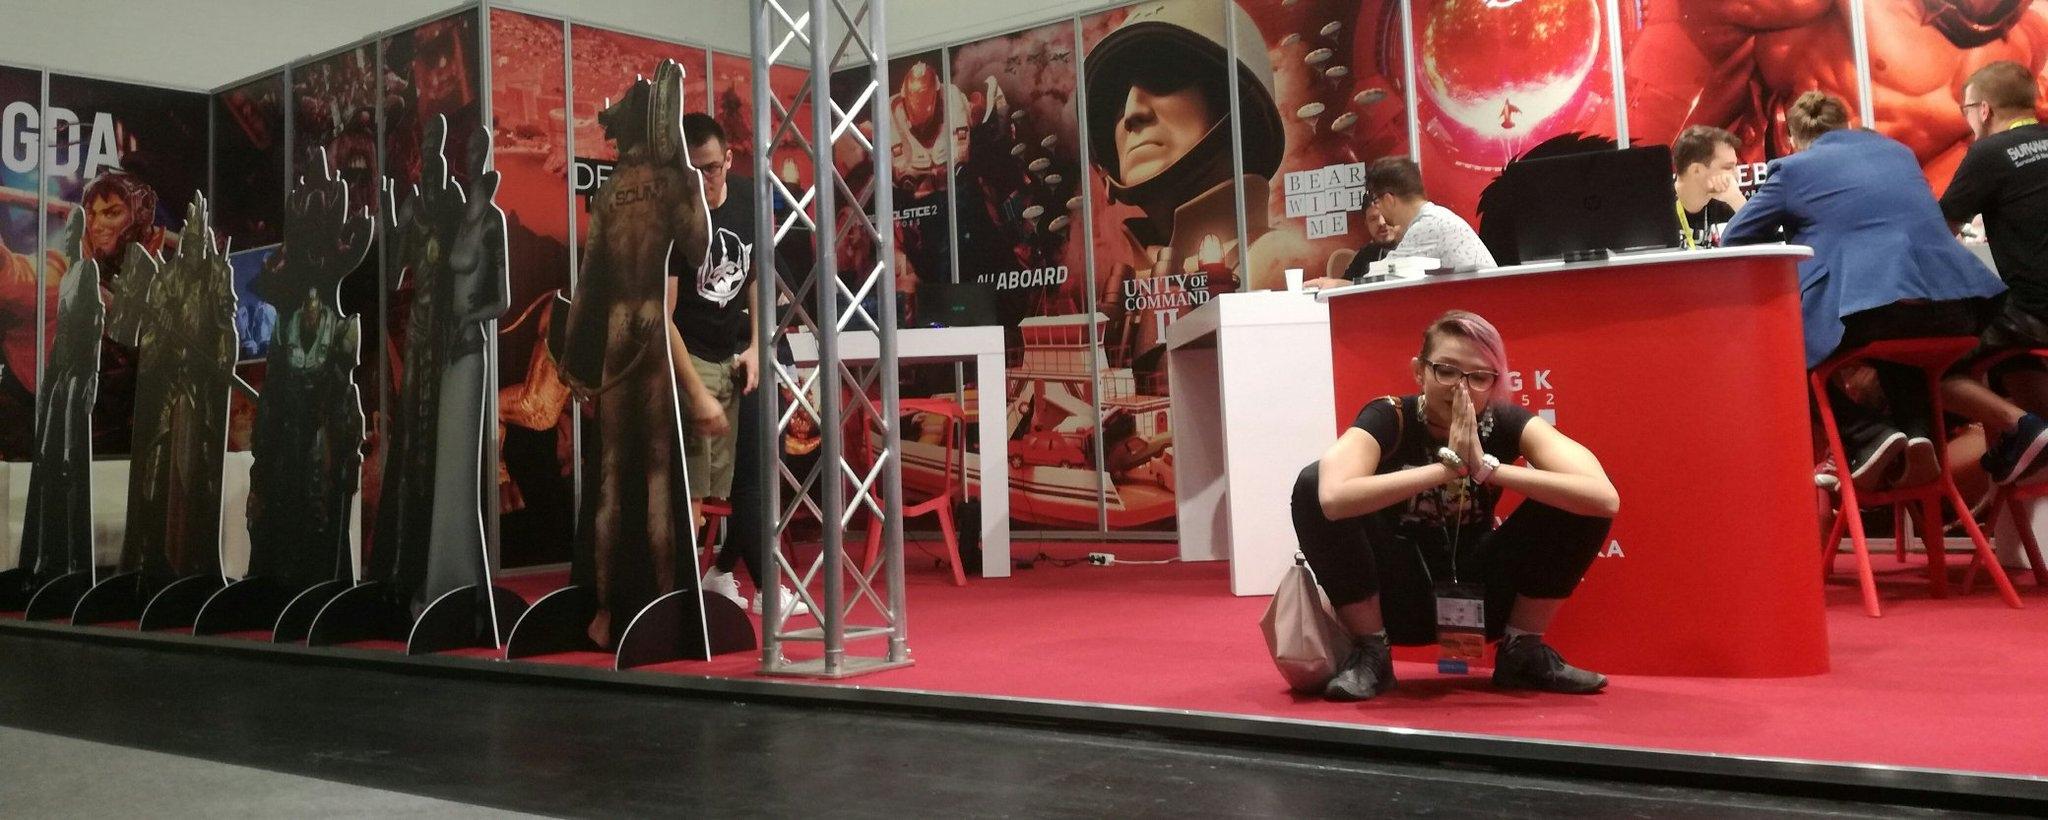 GAMEPIRES. Ivona на выставке GAMESCOM.